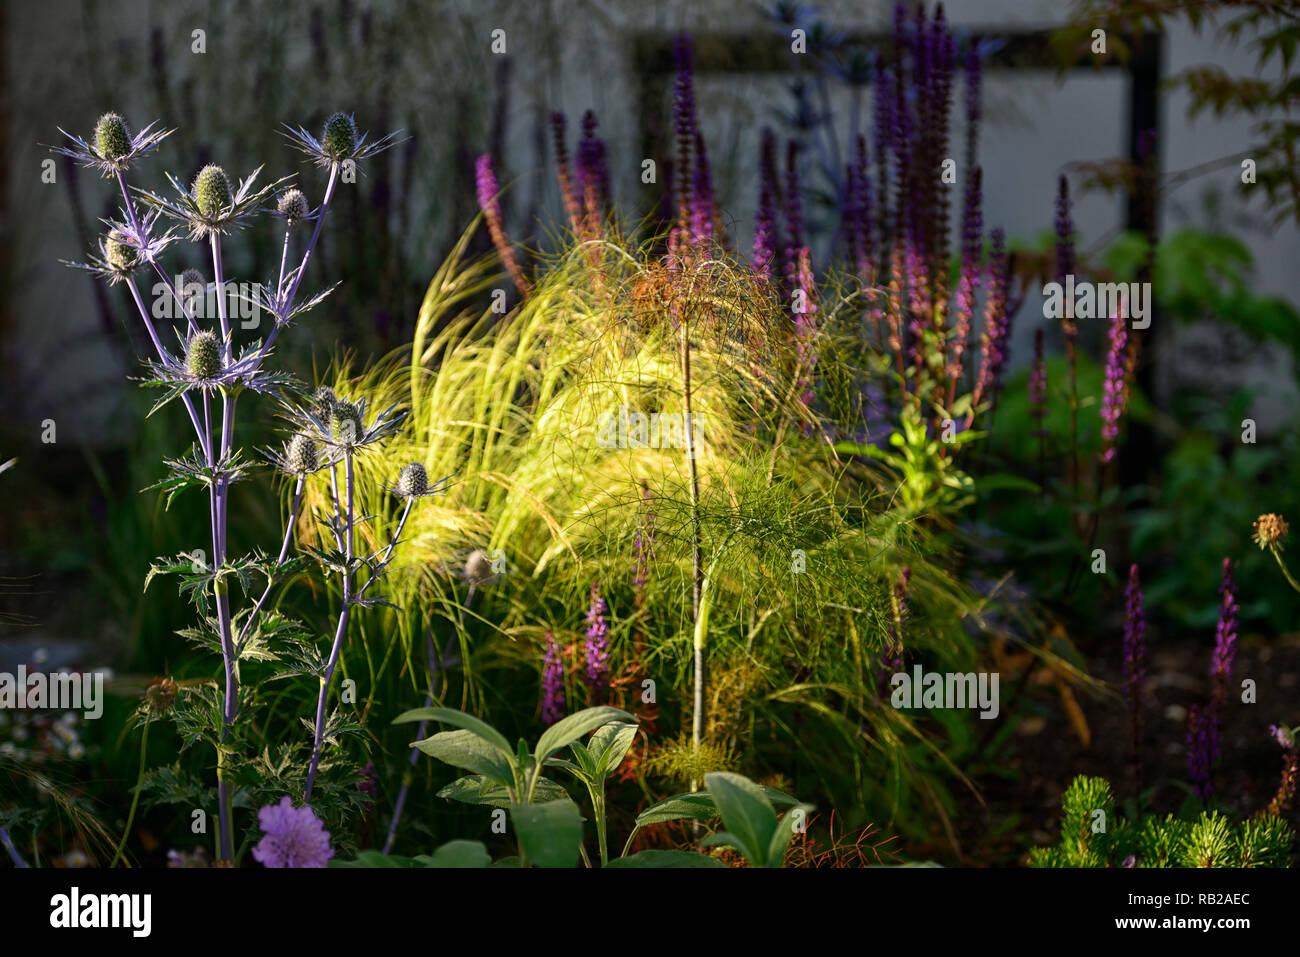 evening sun,illuminates,illuminate,shines,shining,newly planted,mix,mixed,perennial bed,border,scabiosa,eryngium,verbena,acer,gardens,garden design,RM Stock Photo